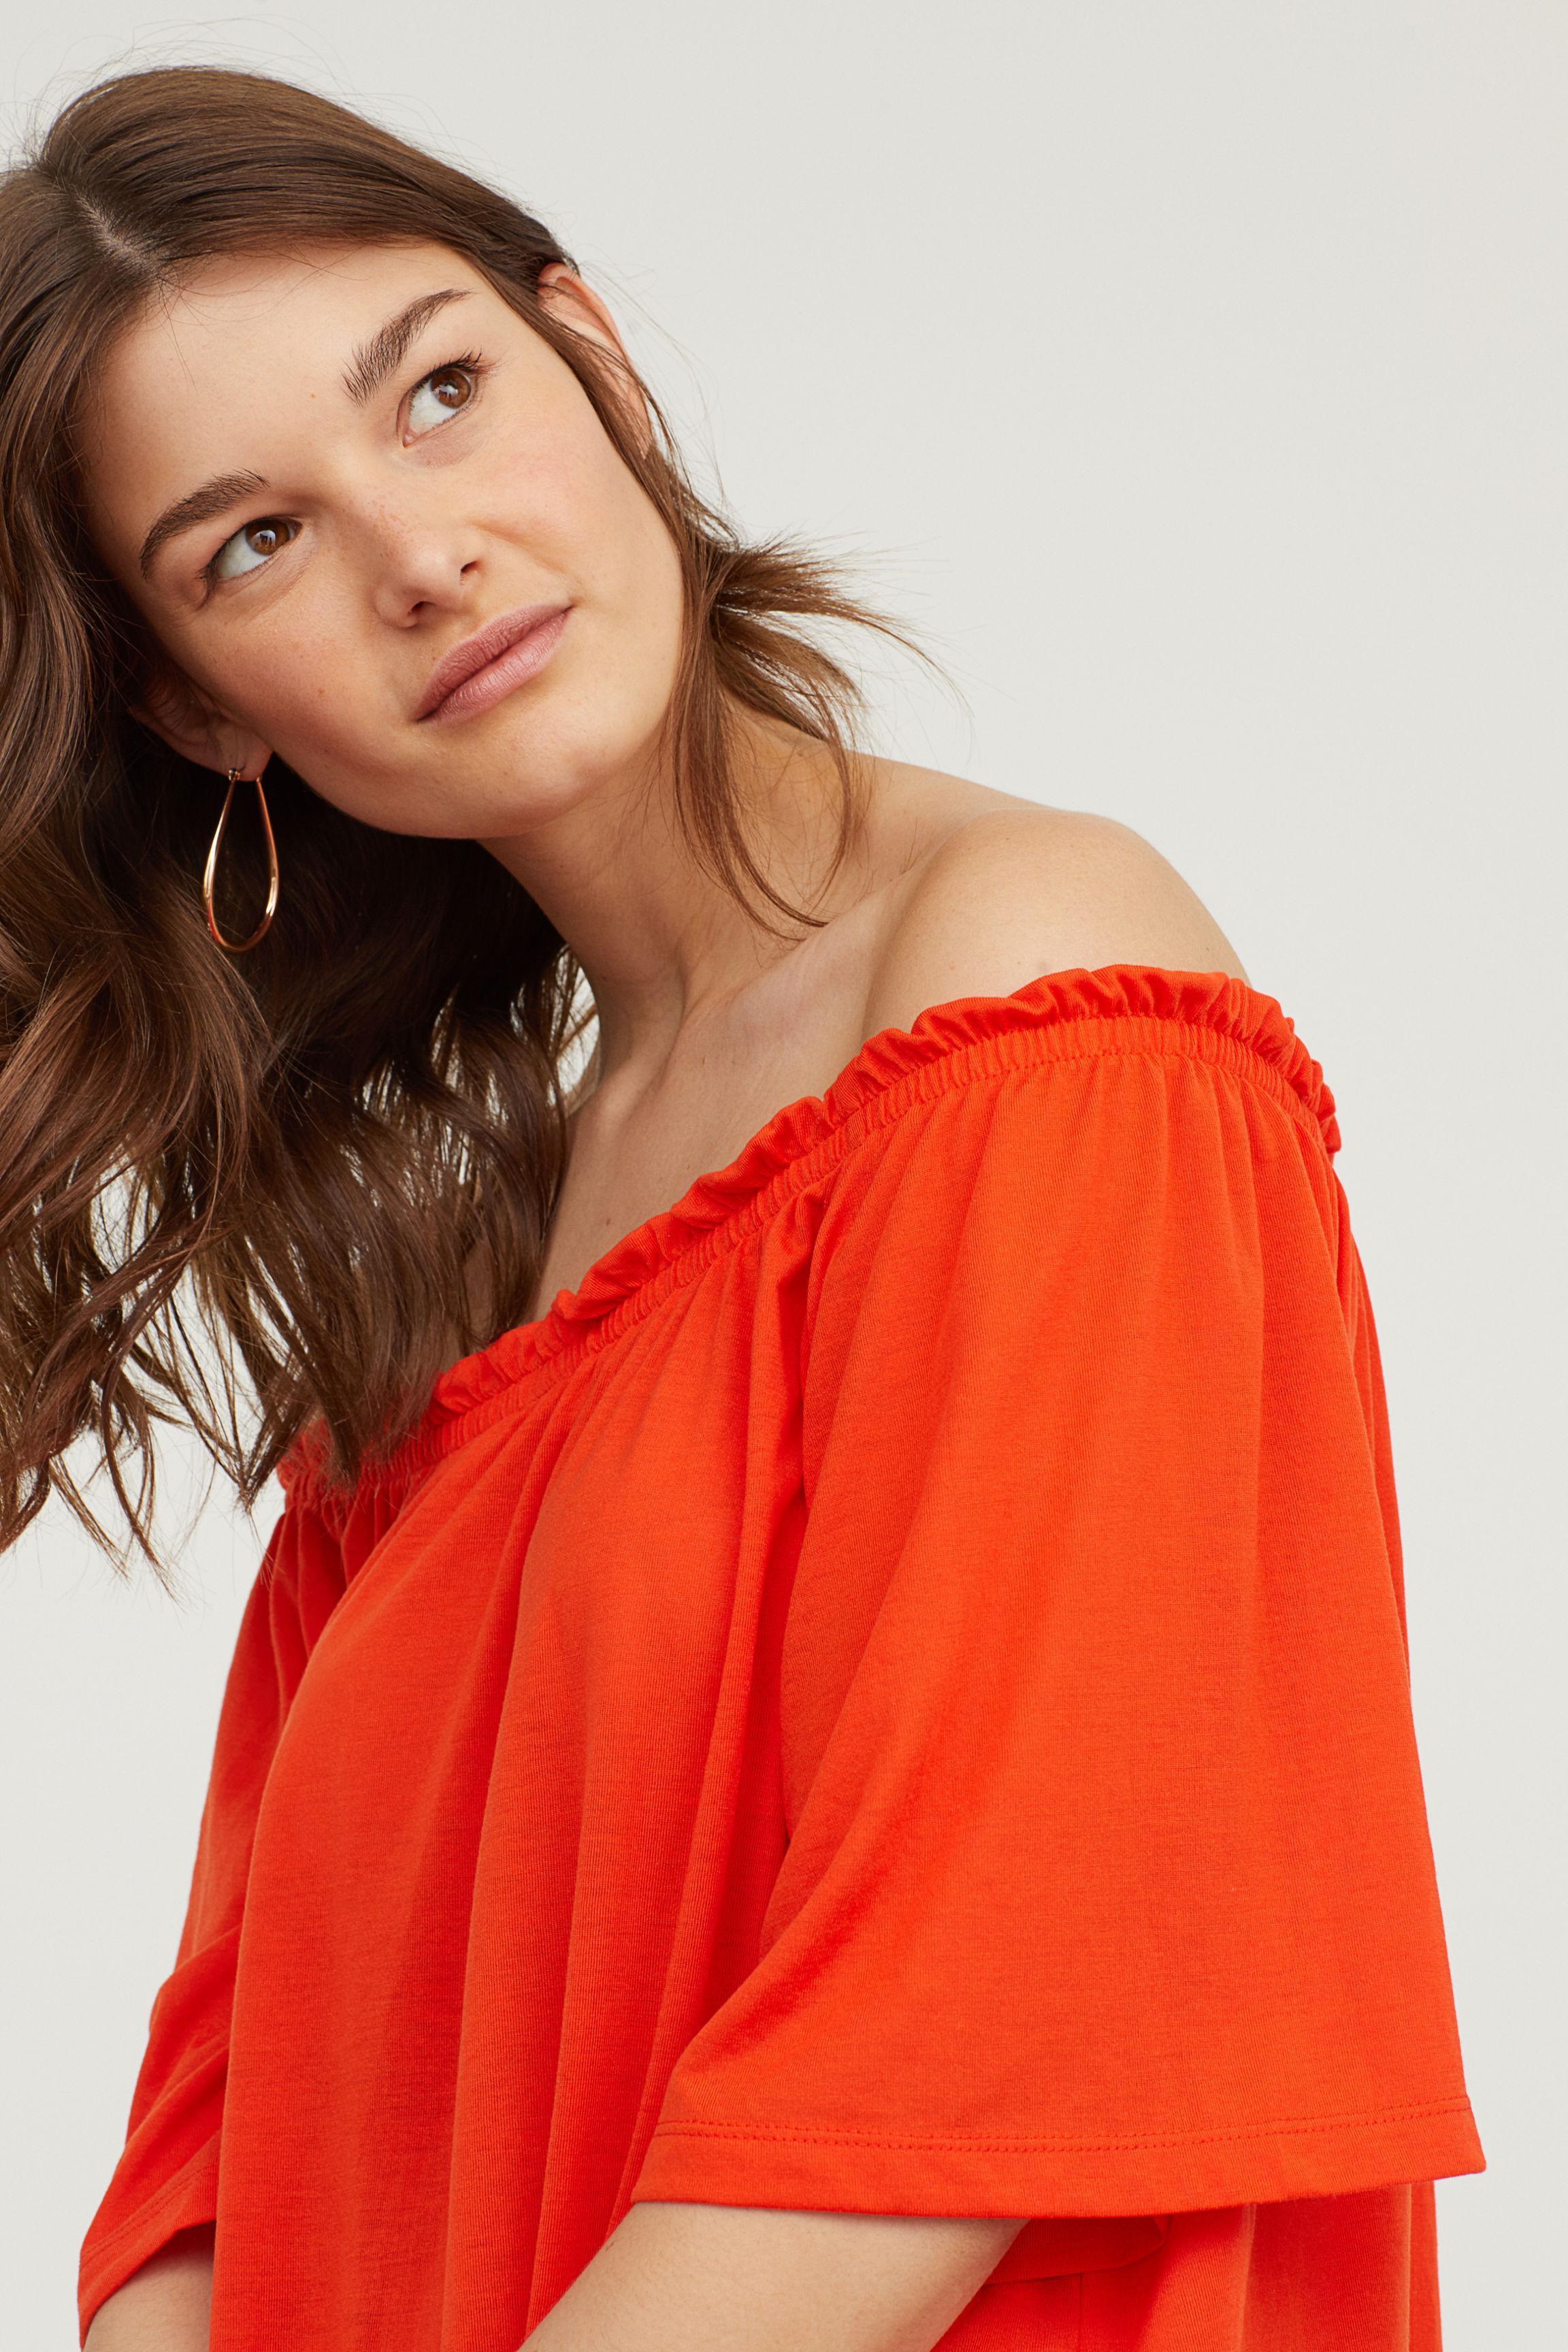 478b997190ac H&M Off-the-shoulder Dress in Orange - Lyst